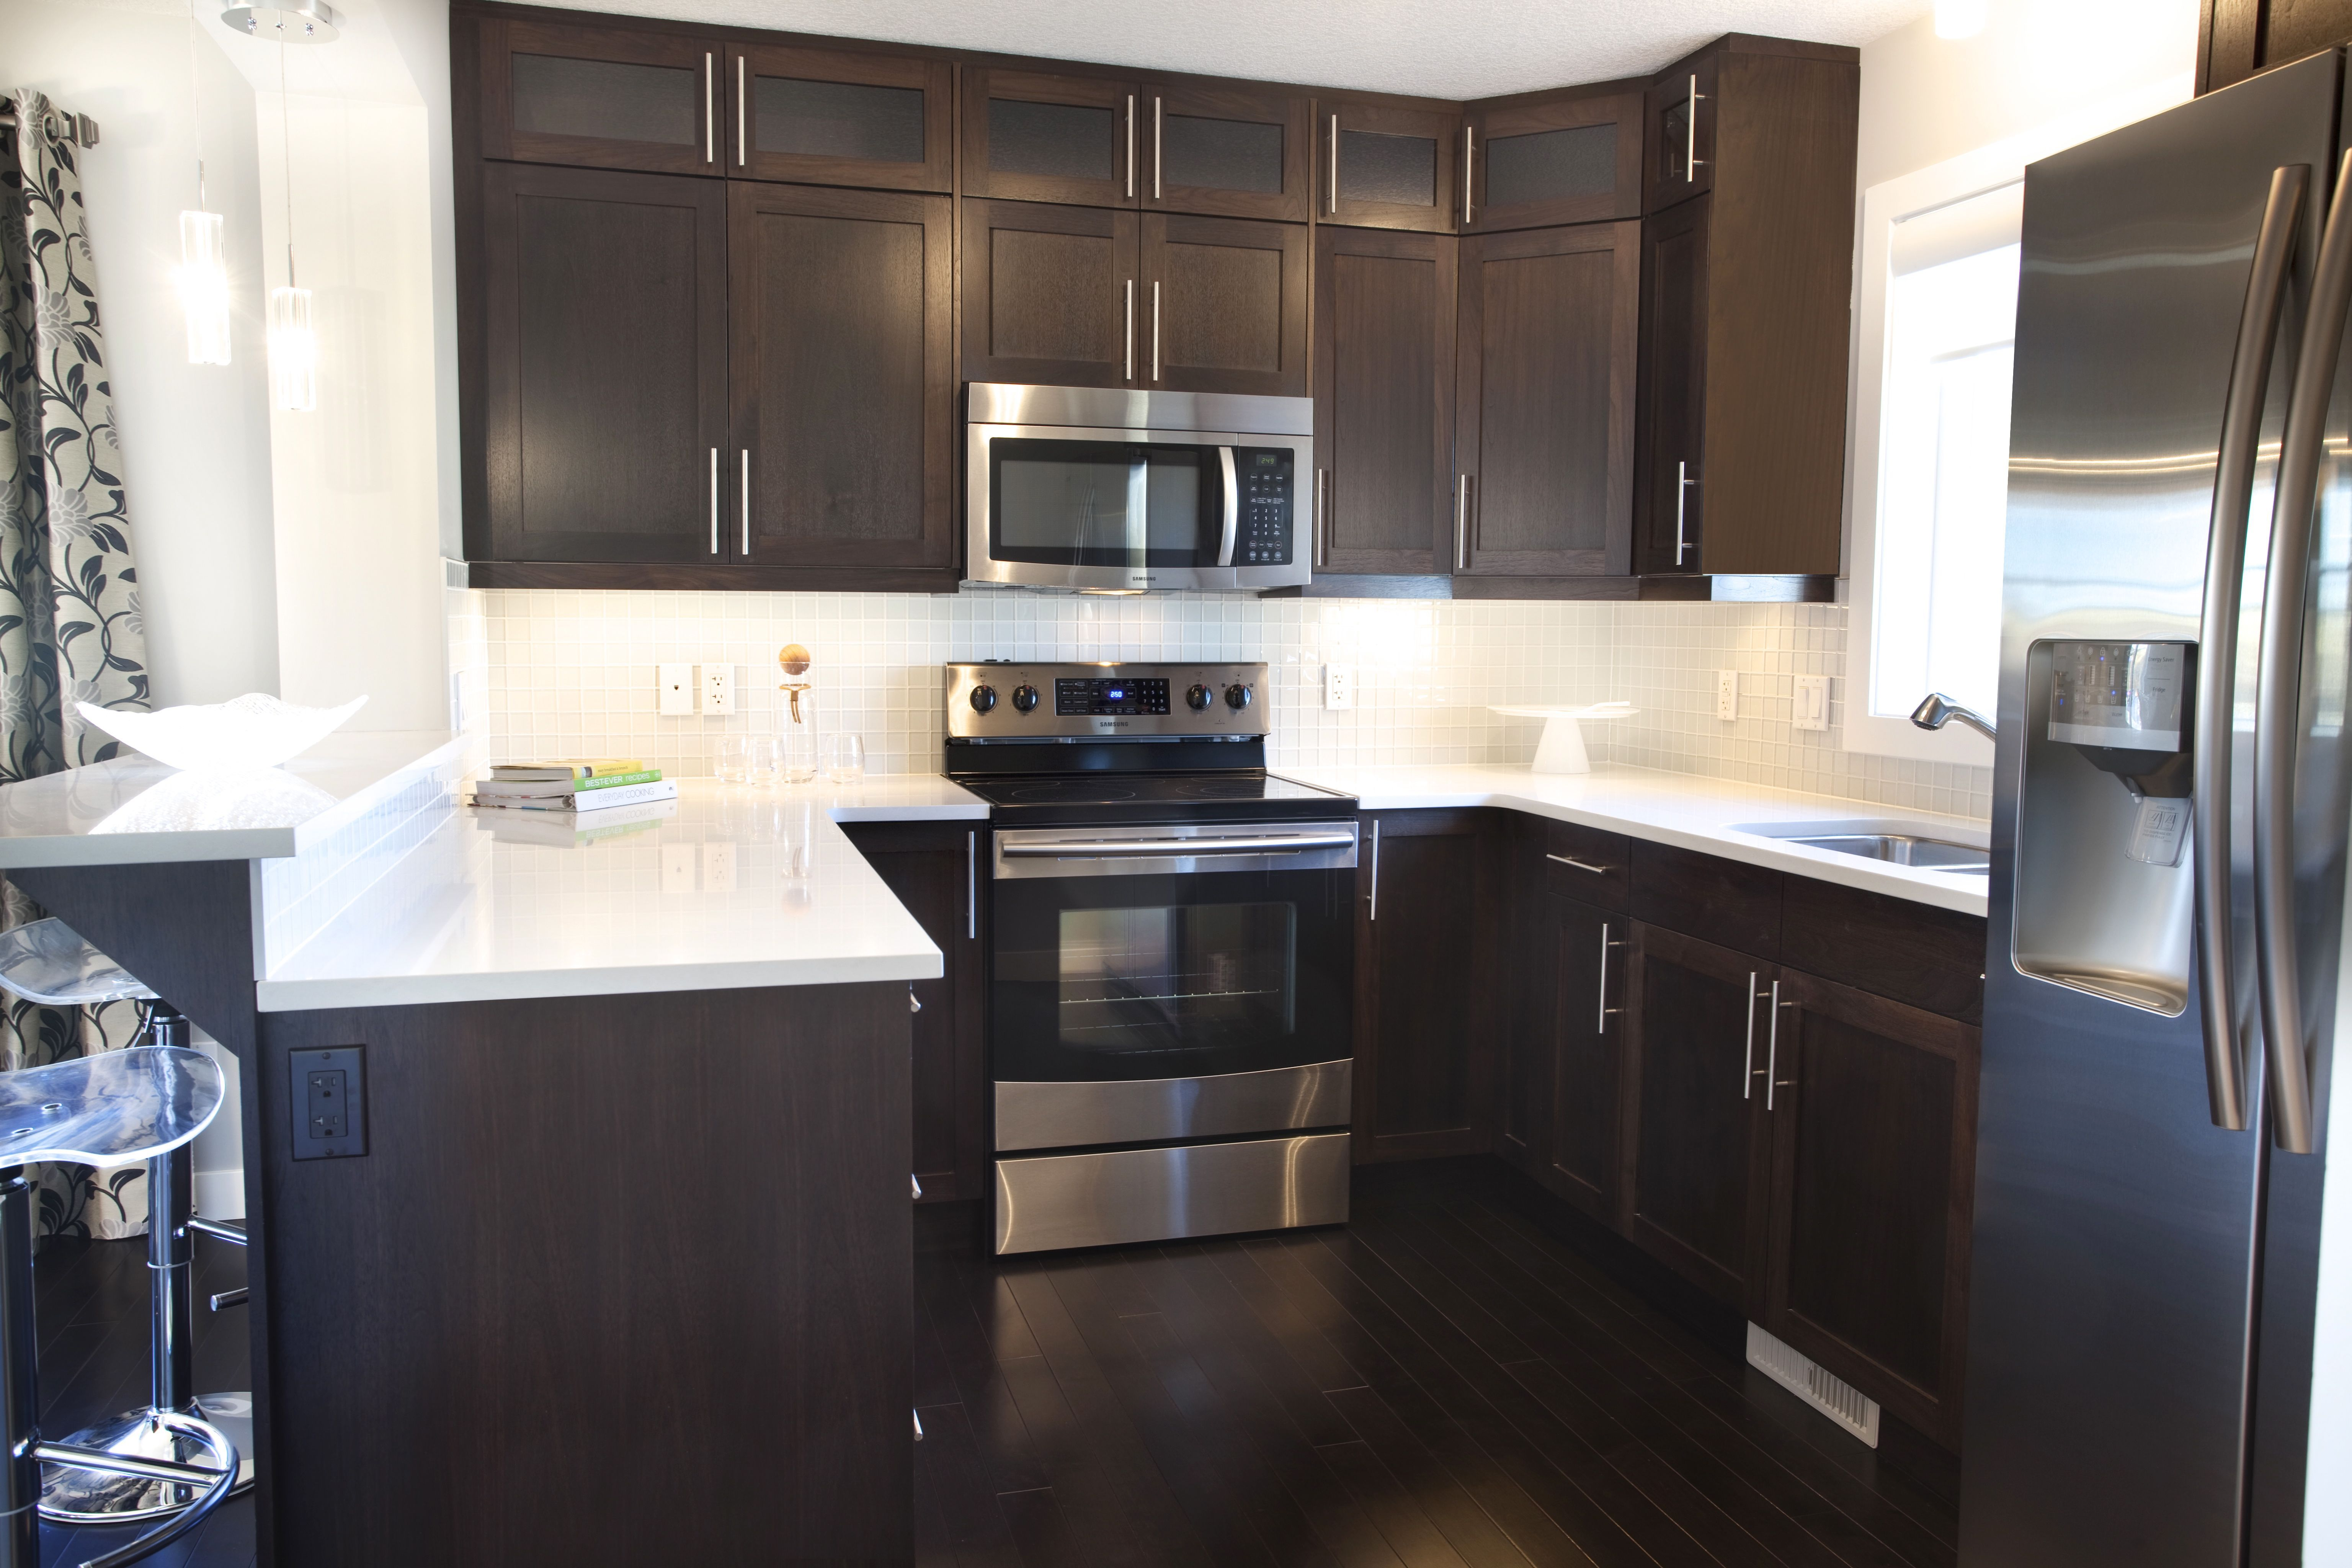 espresso and white kitchen cabinets durable flooring caesarstone quartz countertops organic for the